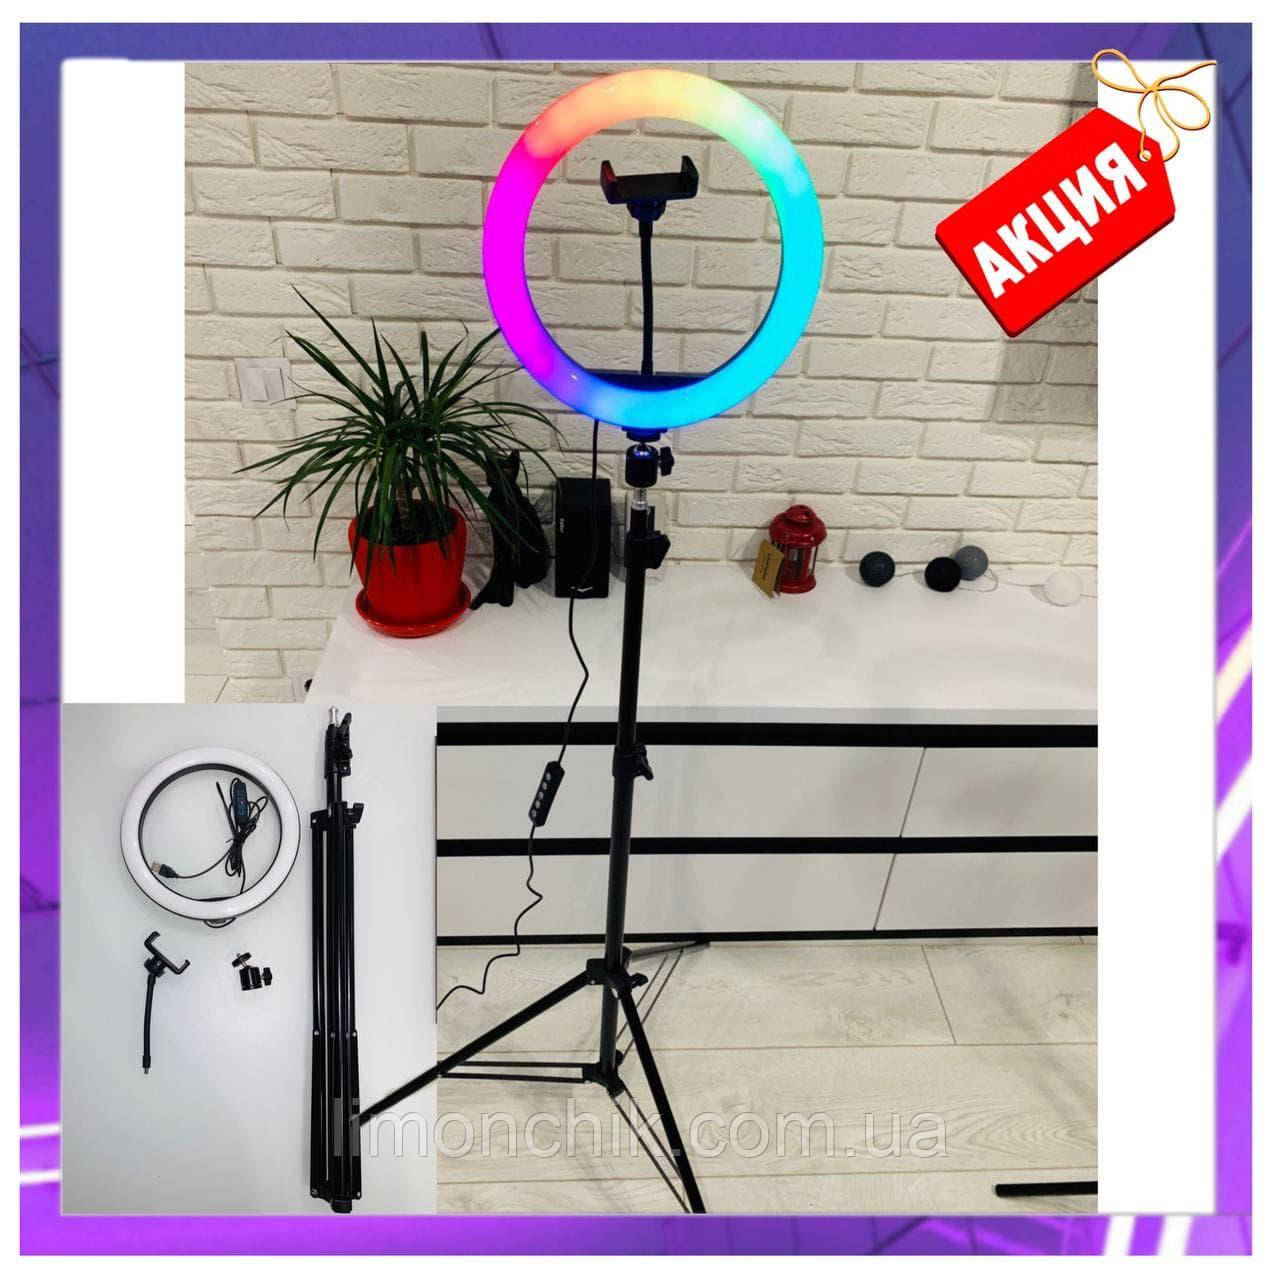 Кольцевая  лампа 26см RGB со штативом 2,1м, лампа блогера, фотографа, светодиодная лед лампа